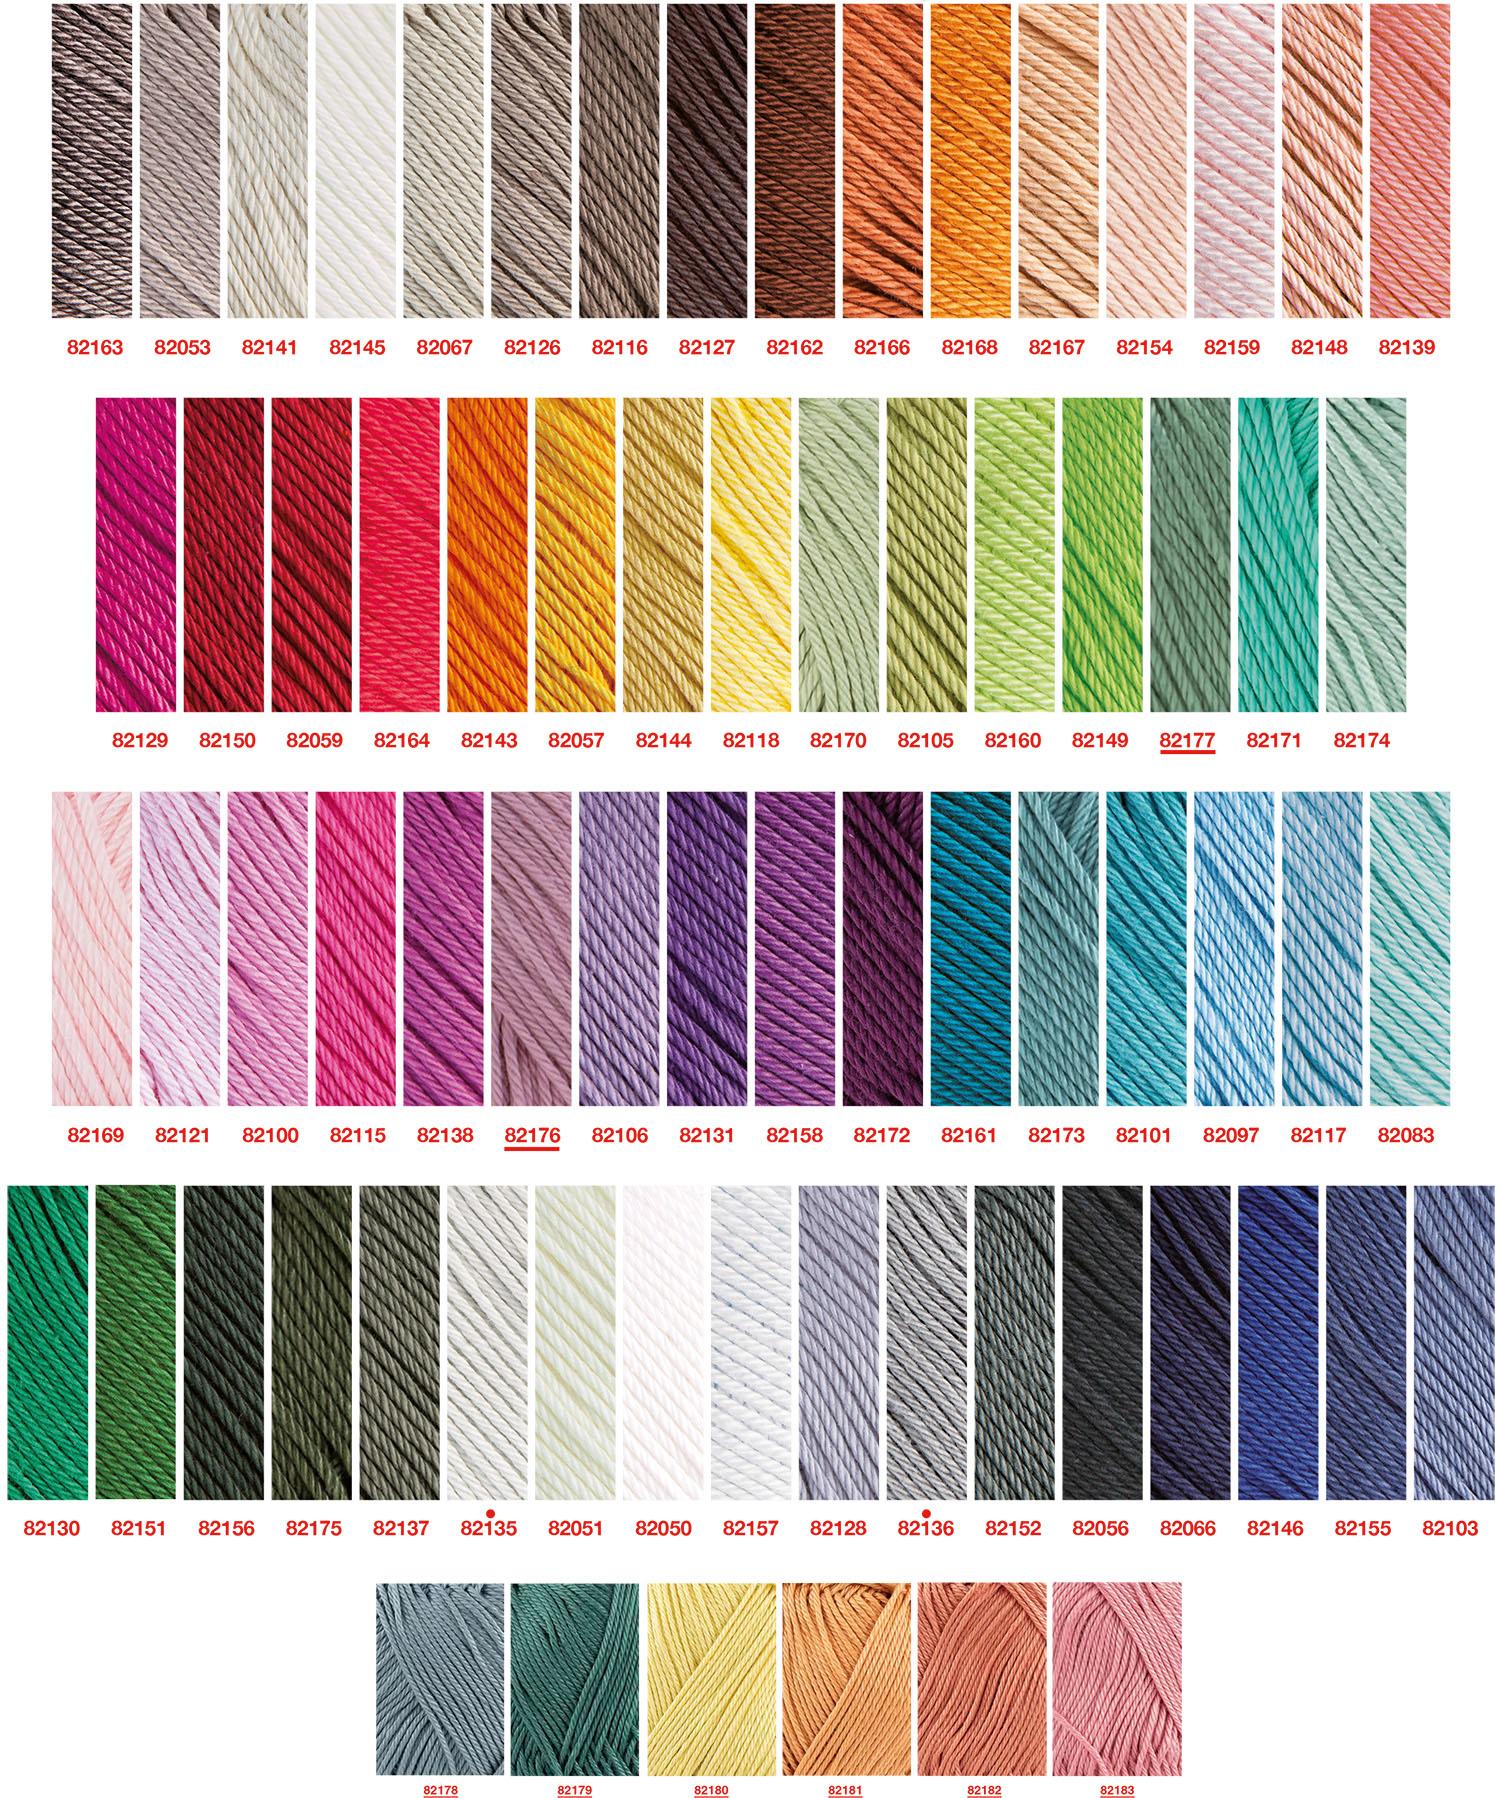 capri kleurenkaart